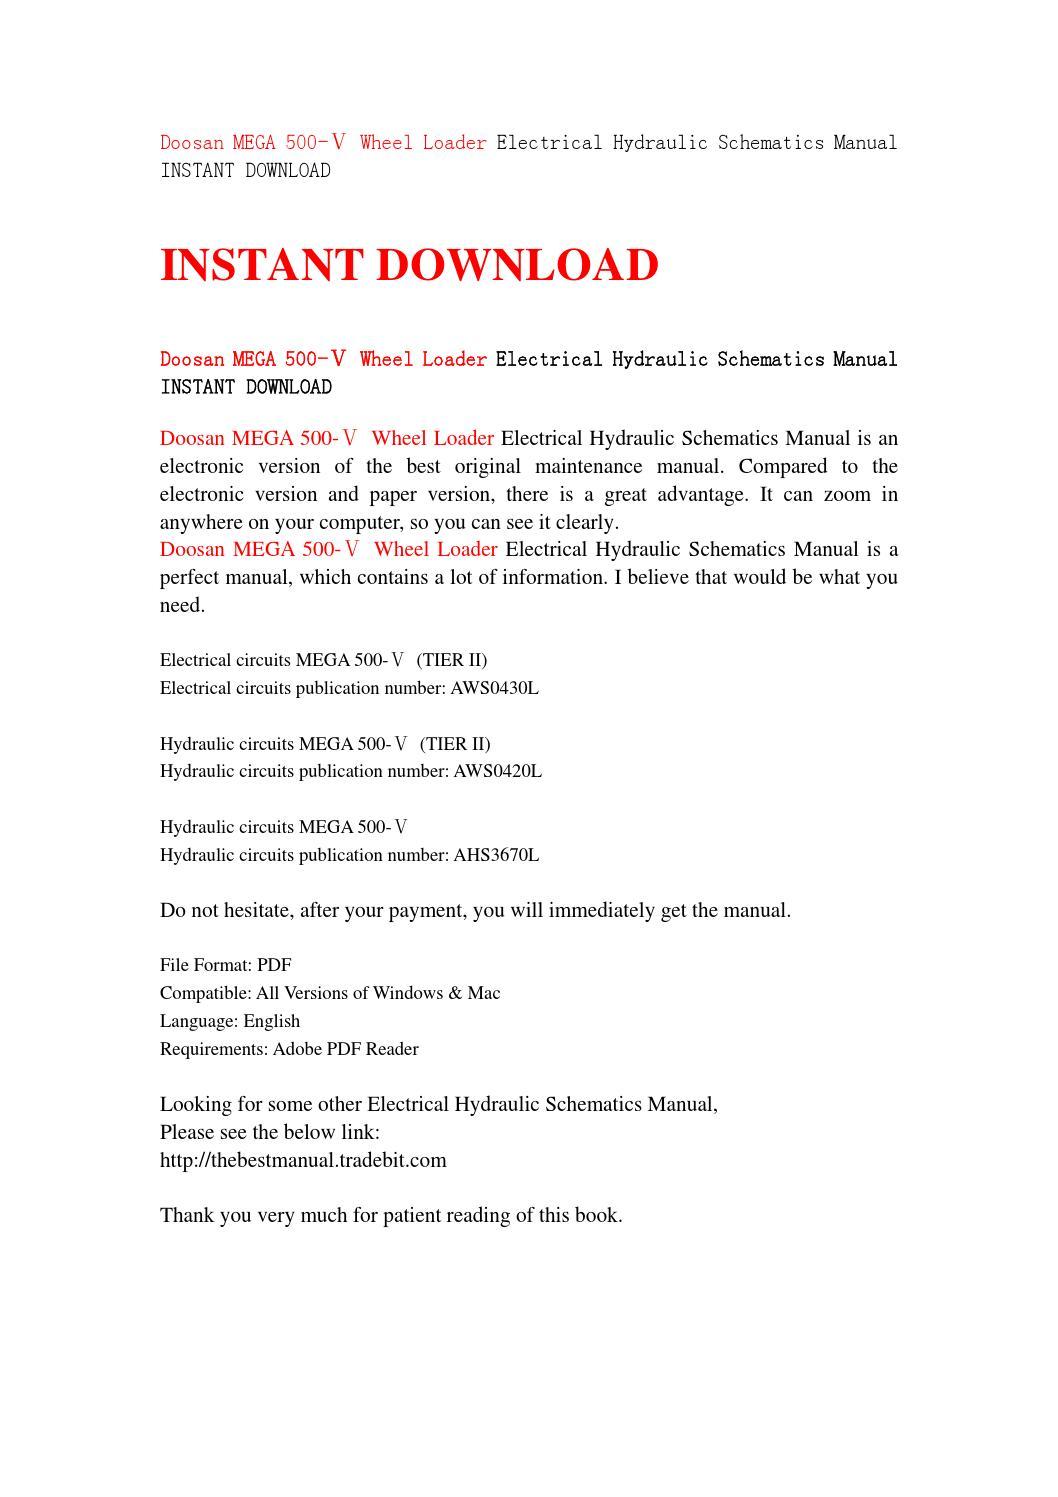 Doosan mega 500 ⅴ wheel loader electrical hydraulic schematics manual  instant download by jshnefen - issuu